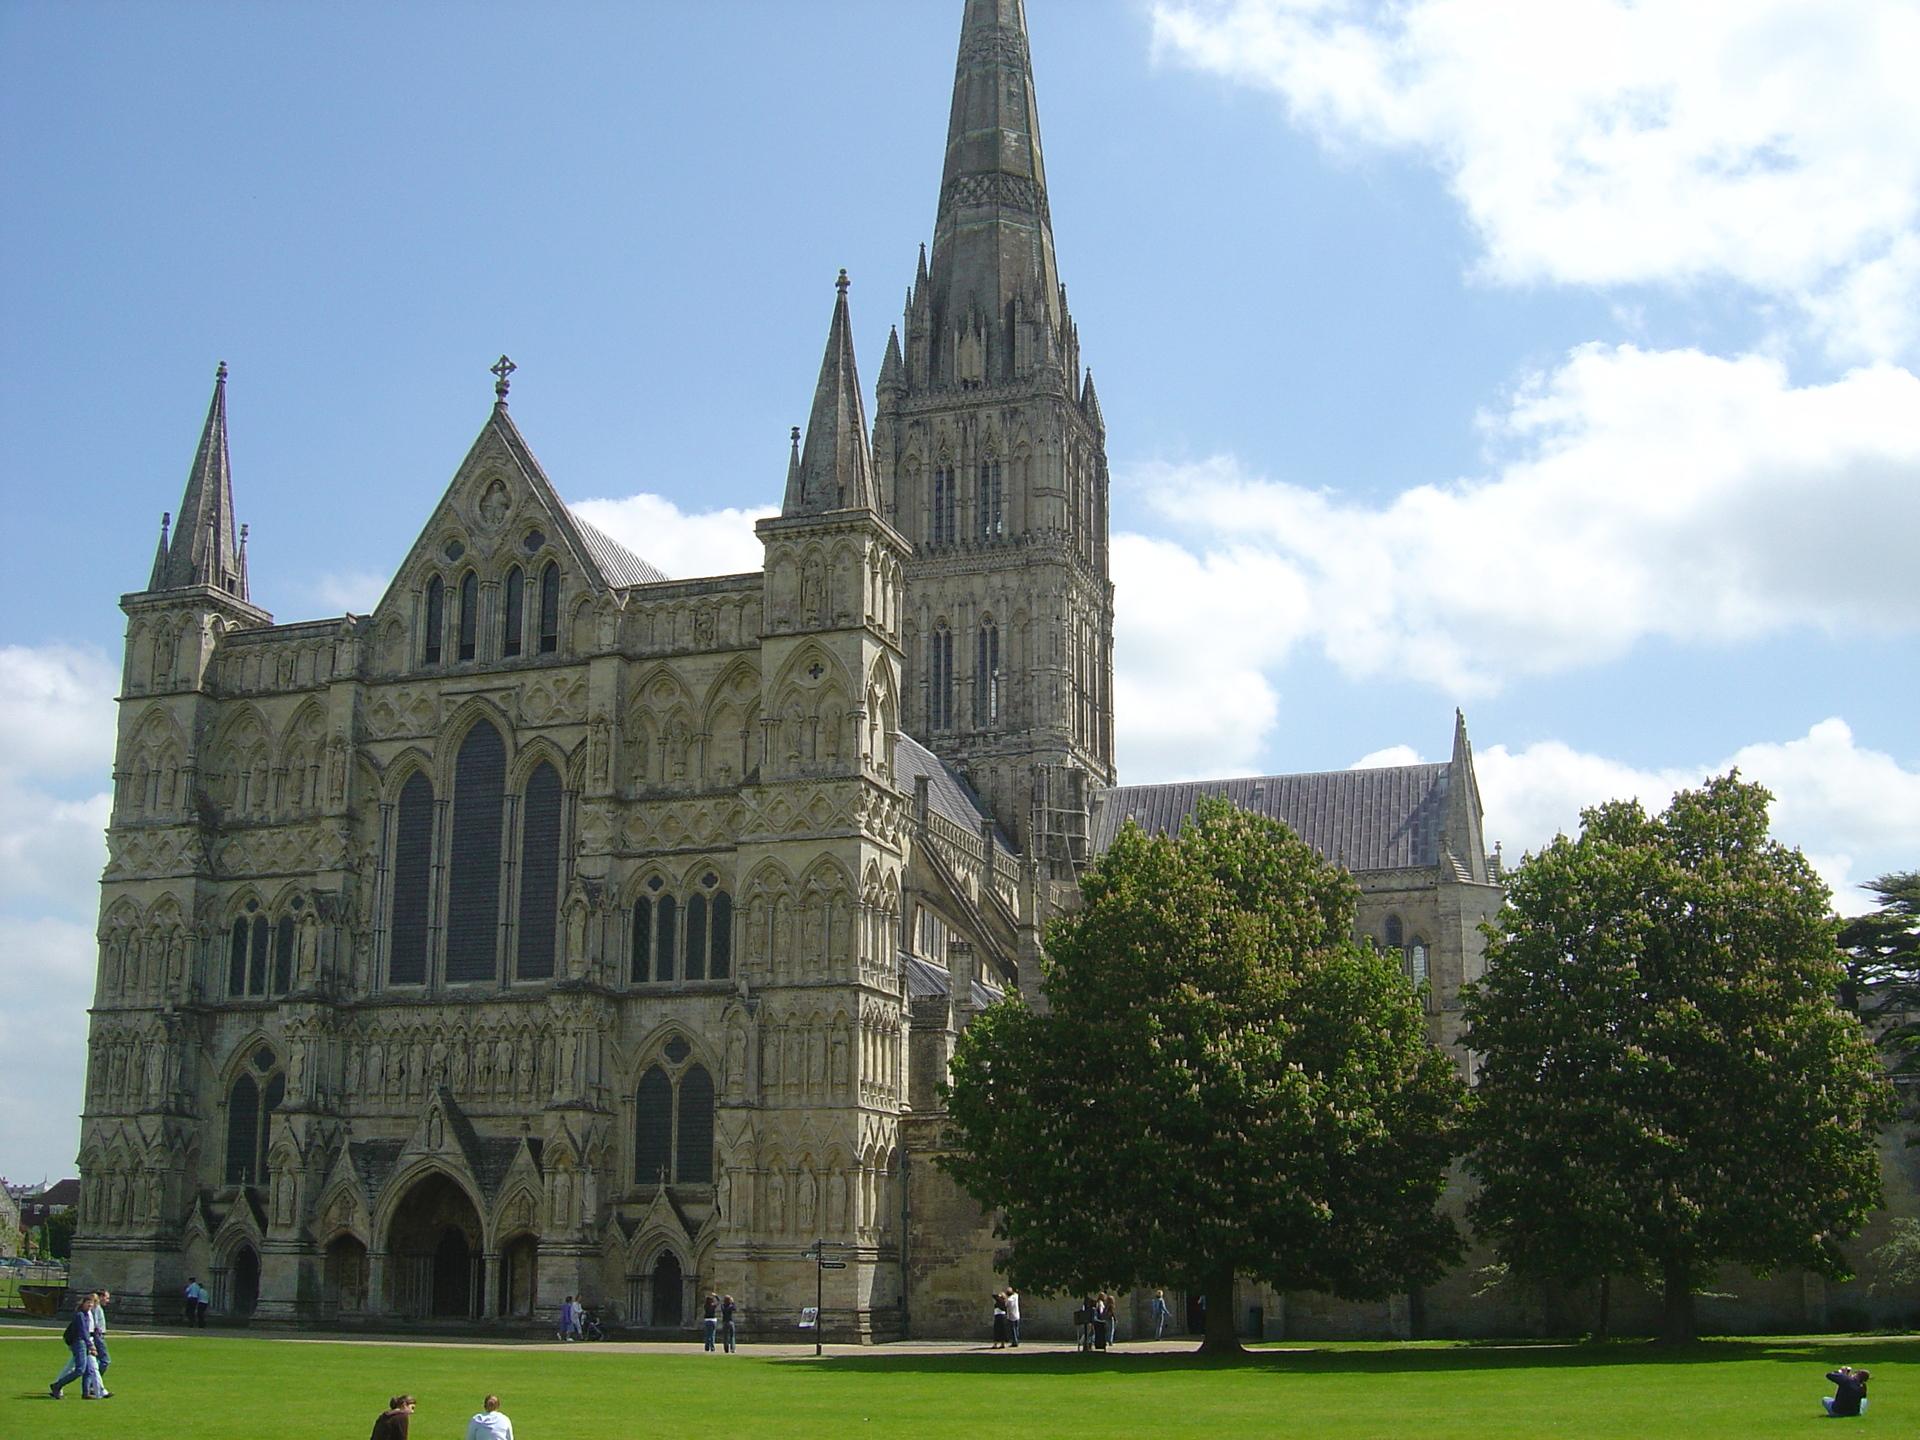 salisbury cathedral - photo #18